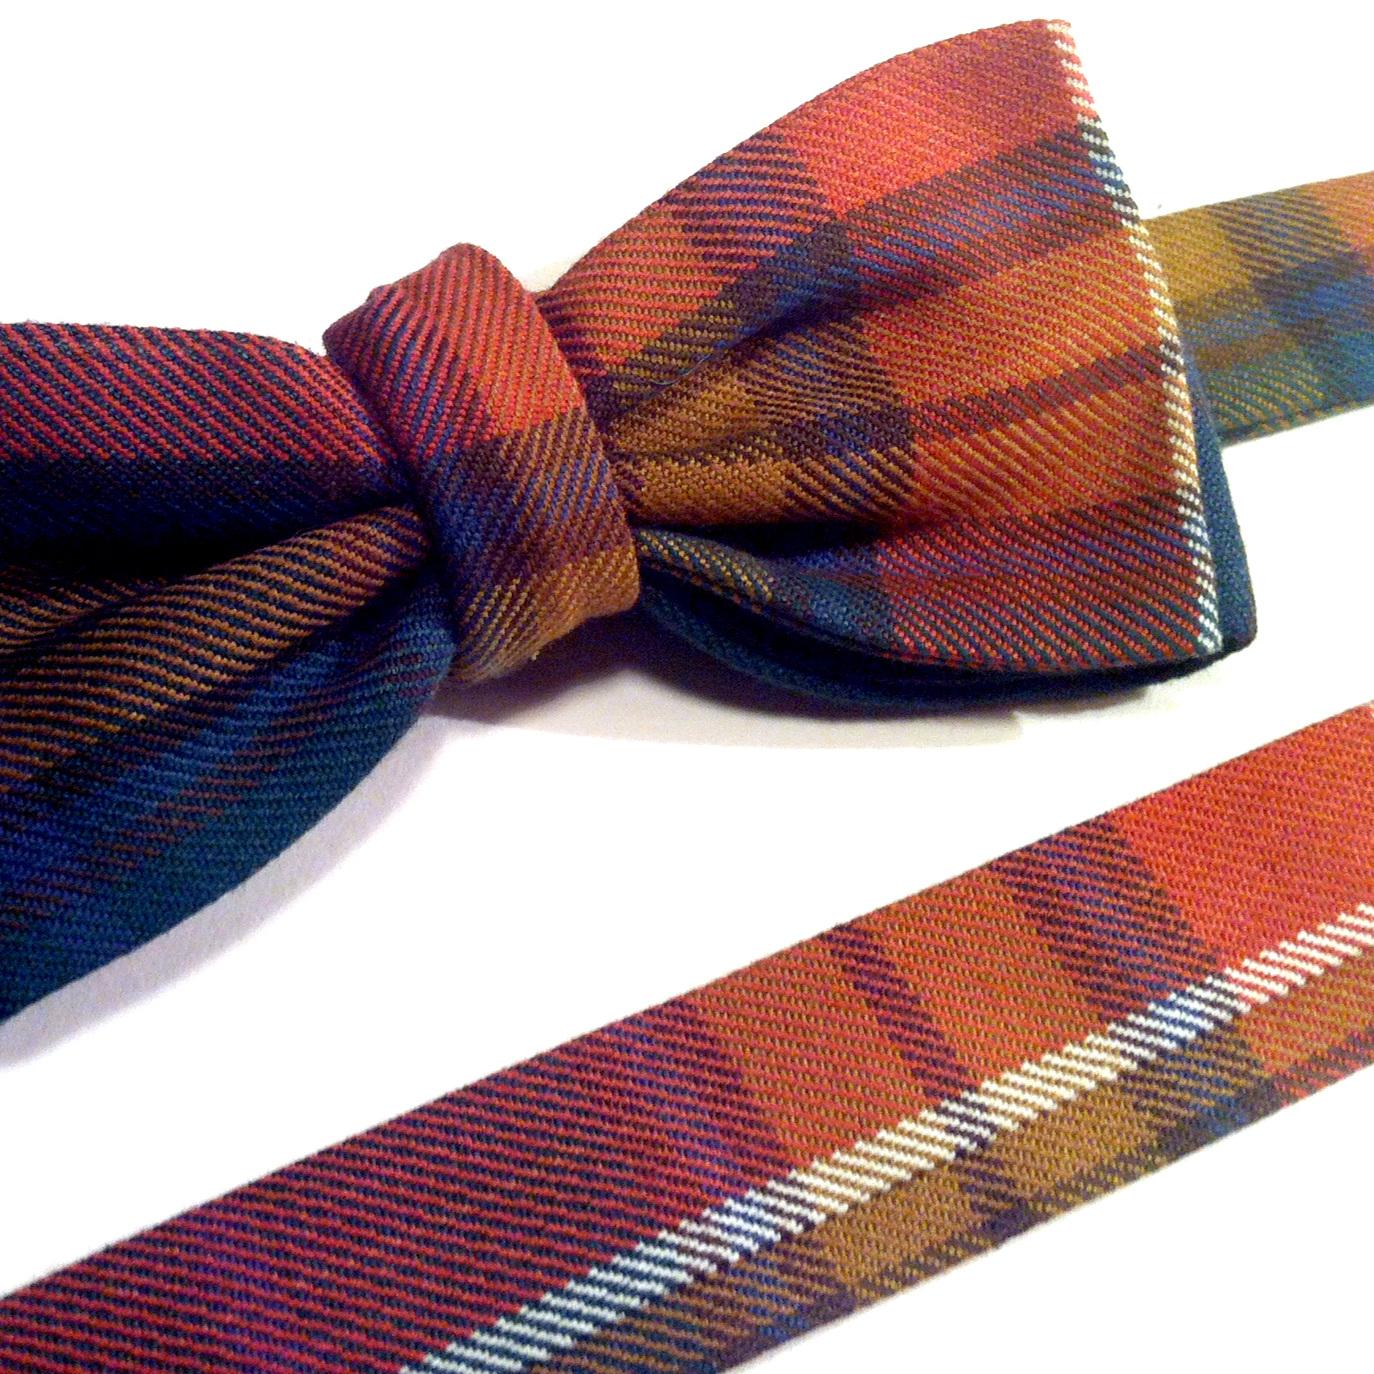 The Edinburgh Bow Tie Company